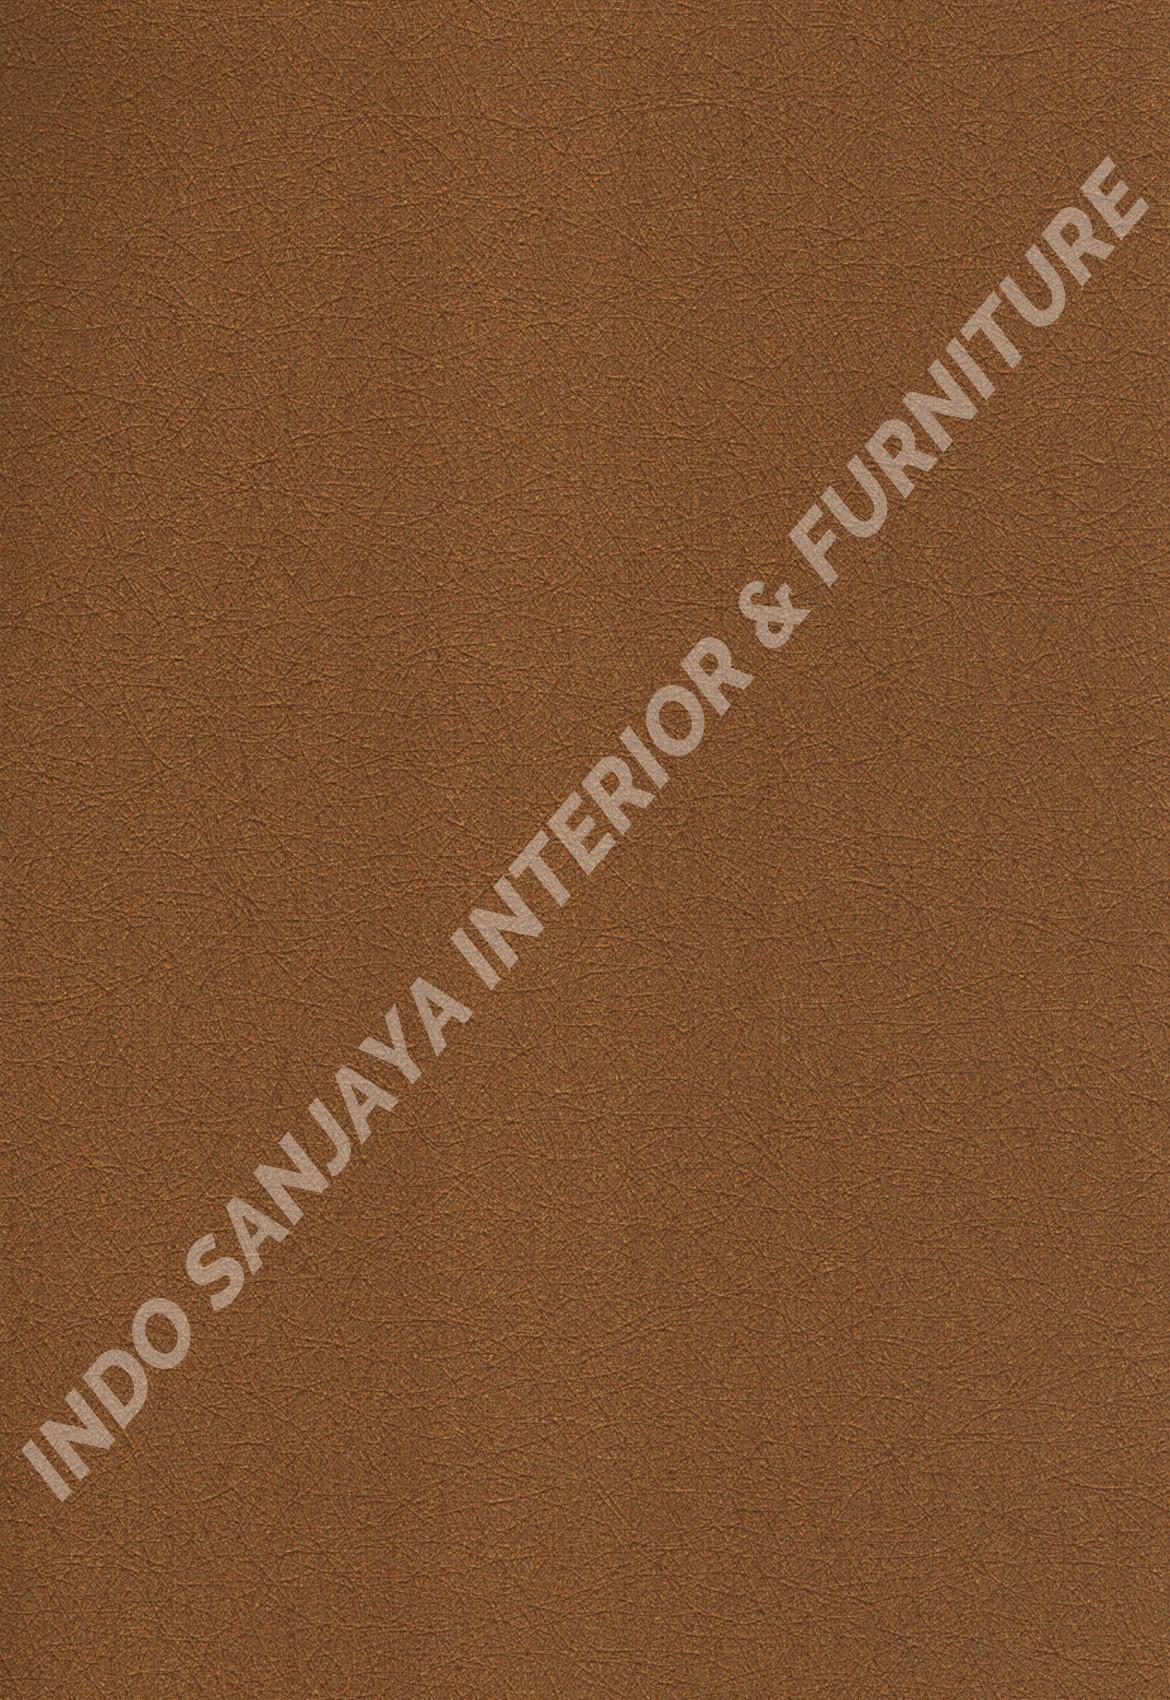 wallpaper   Wallpaper Minimalis Polos 83129-4:83129-4 corak  warna